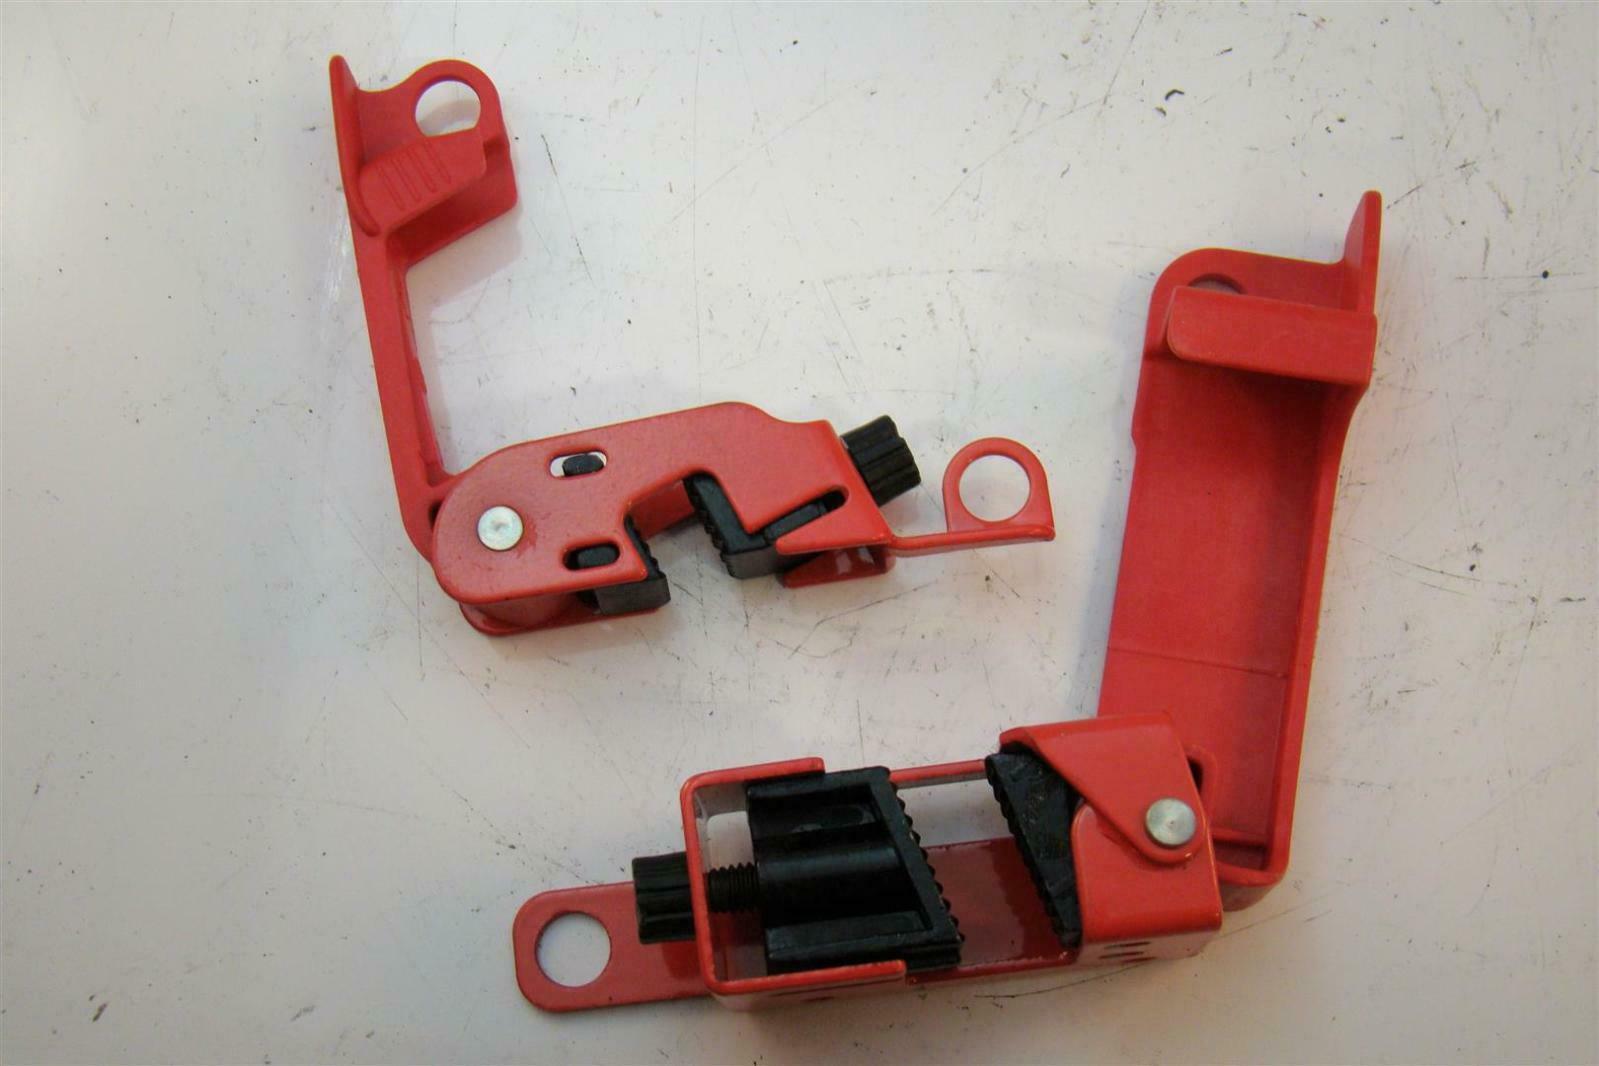 aij 140 master lock grip tight circuit breaker lockout set 2cjk2 5 master lock grip tight circuit breaker lockout set 2cjk2 ebay  at gsmportal.co